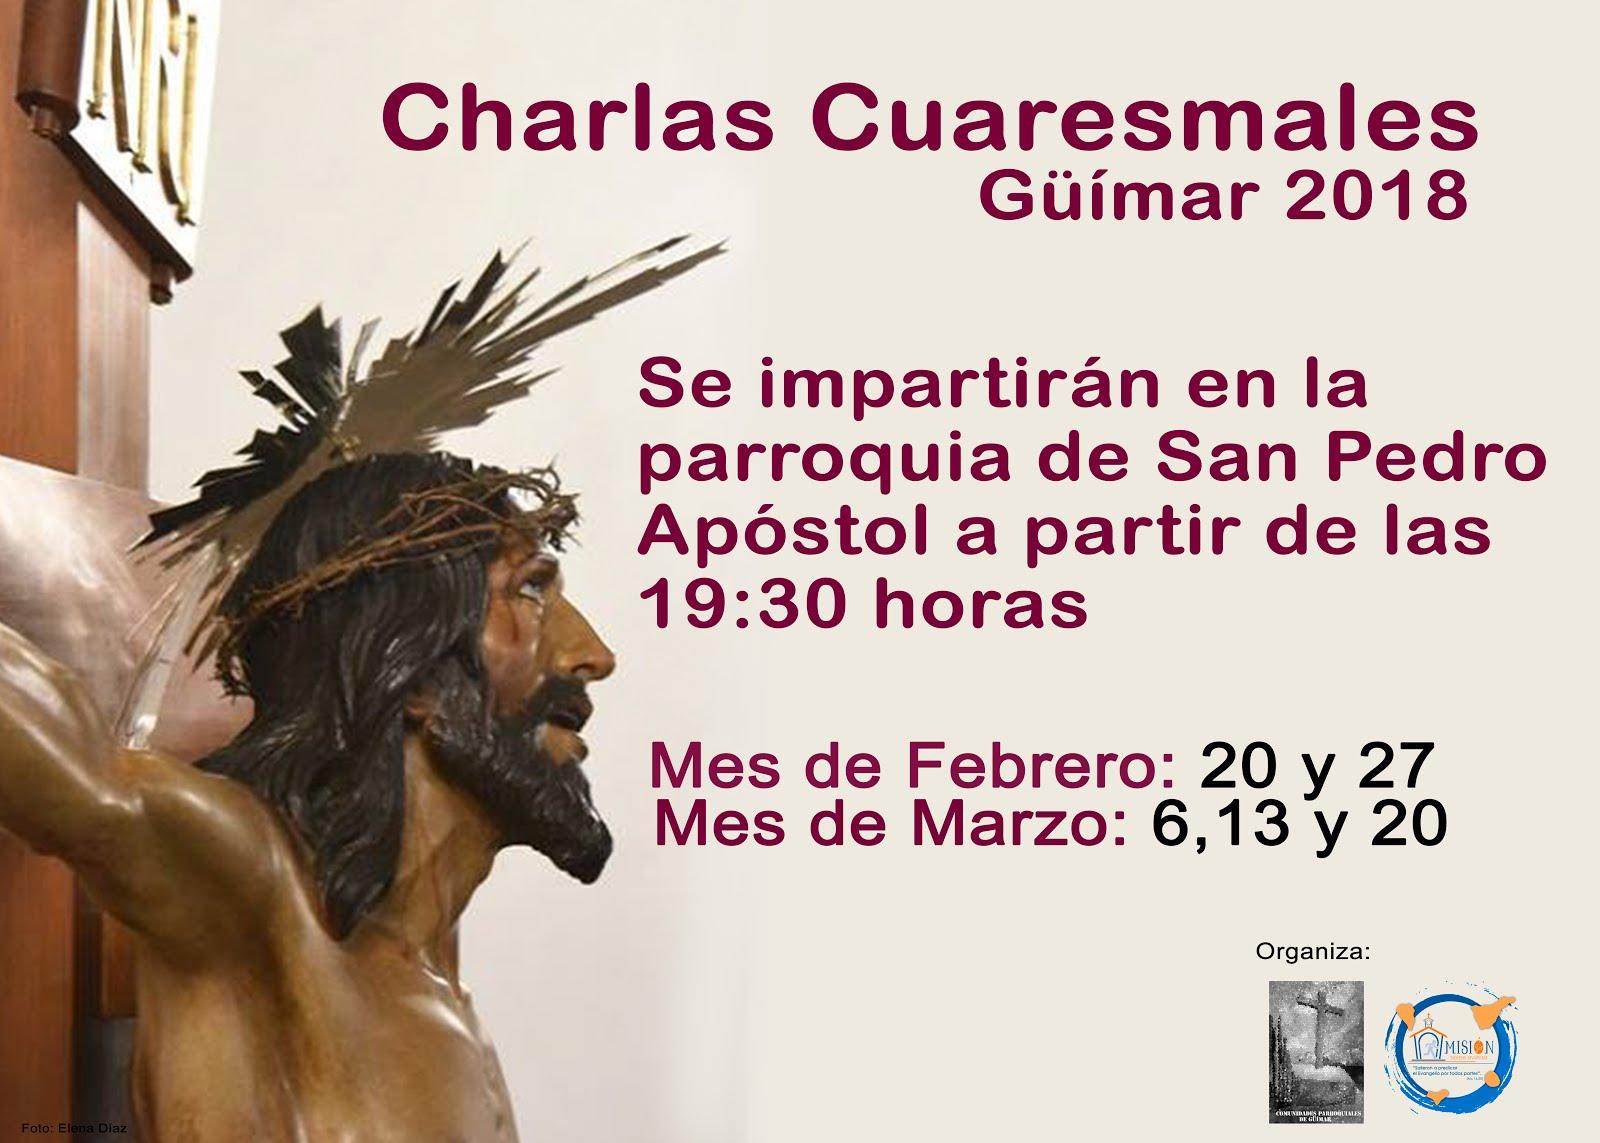 Charlas Cuaresmales